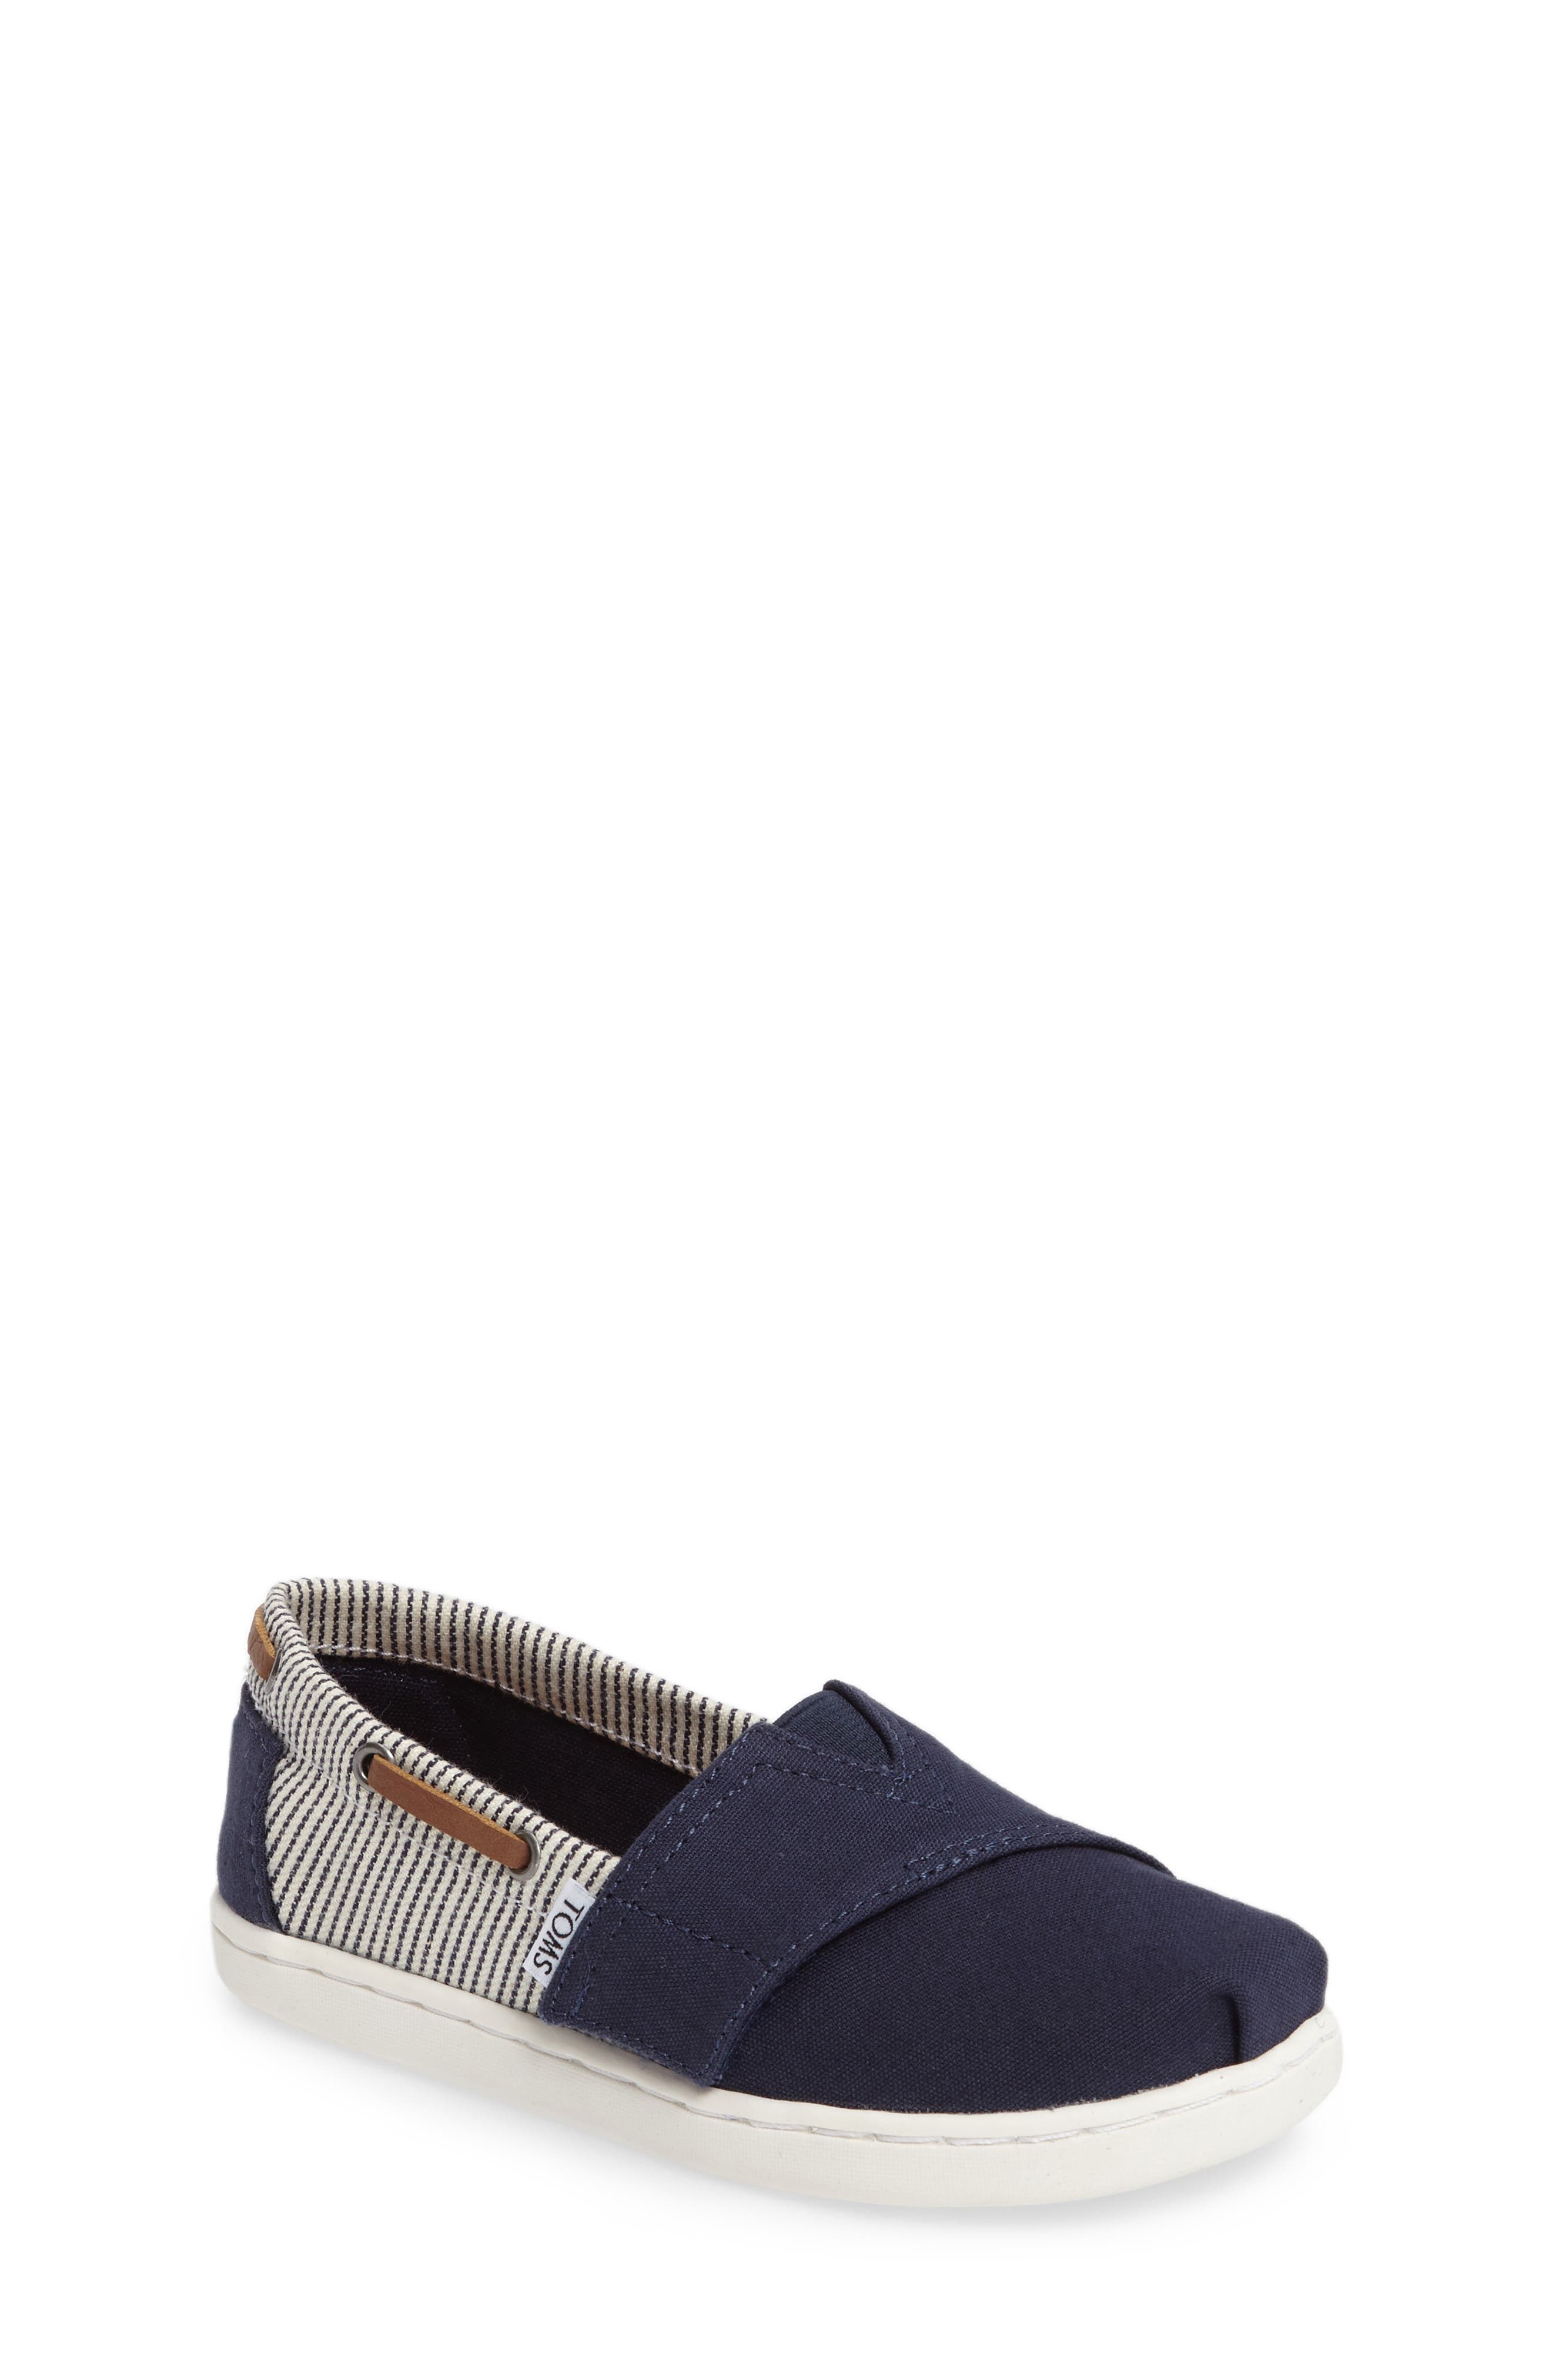 'Bimini' Print Slip-On,                         Main,                         color, Navy Canvas/ Stripes